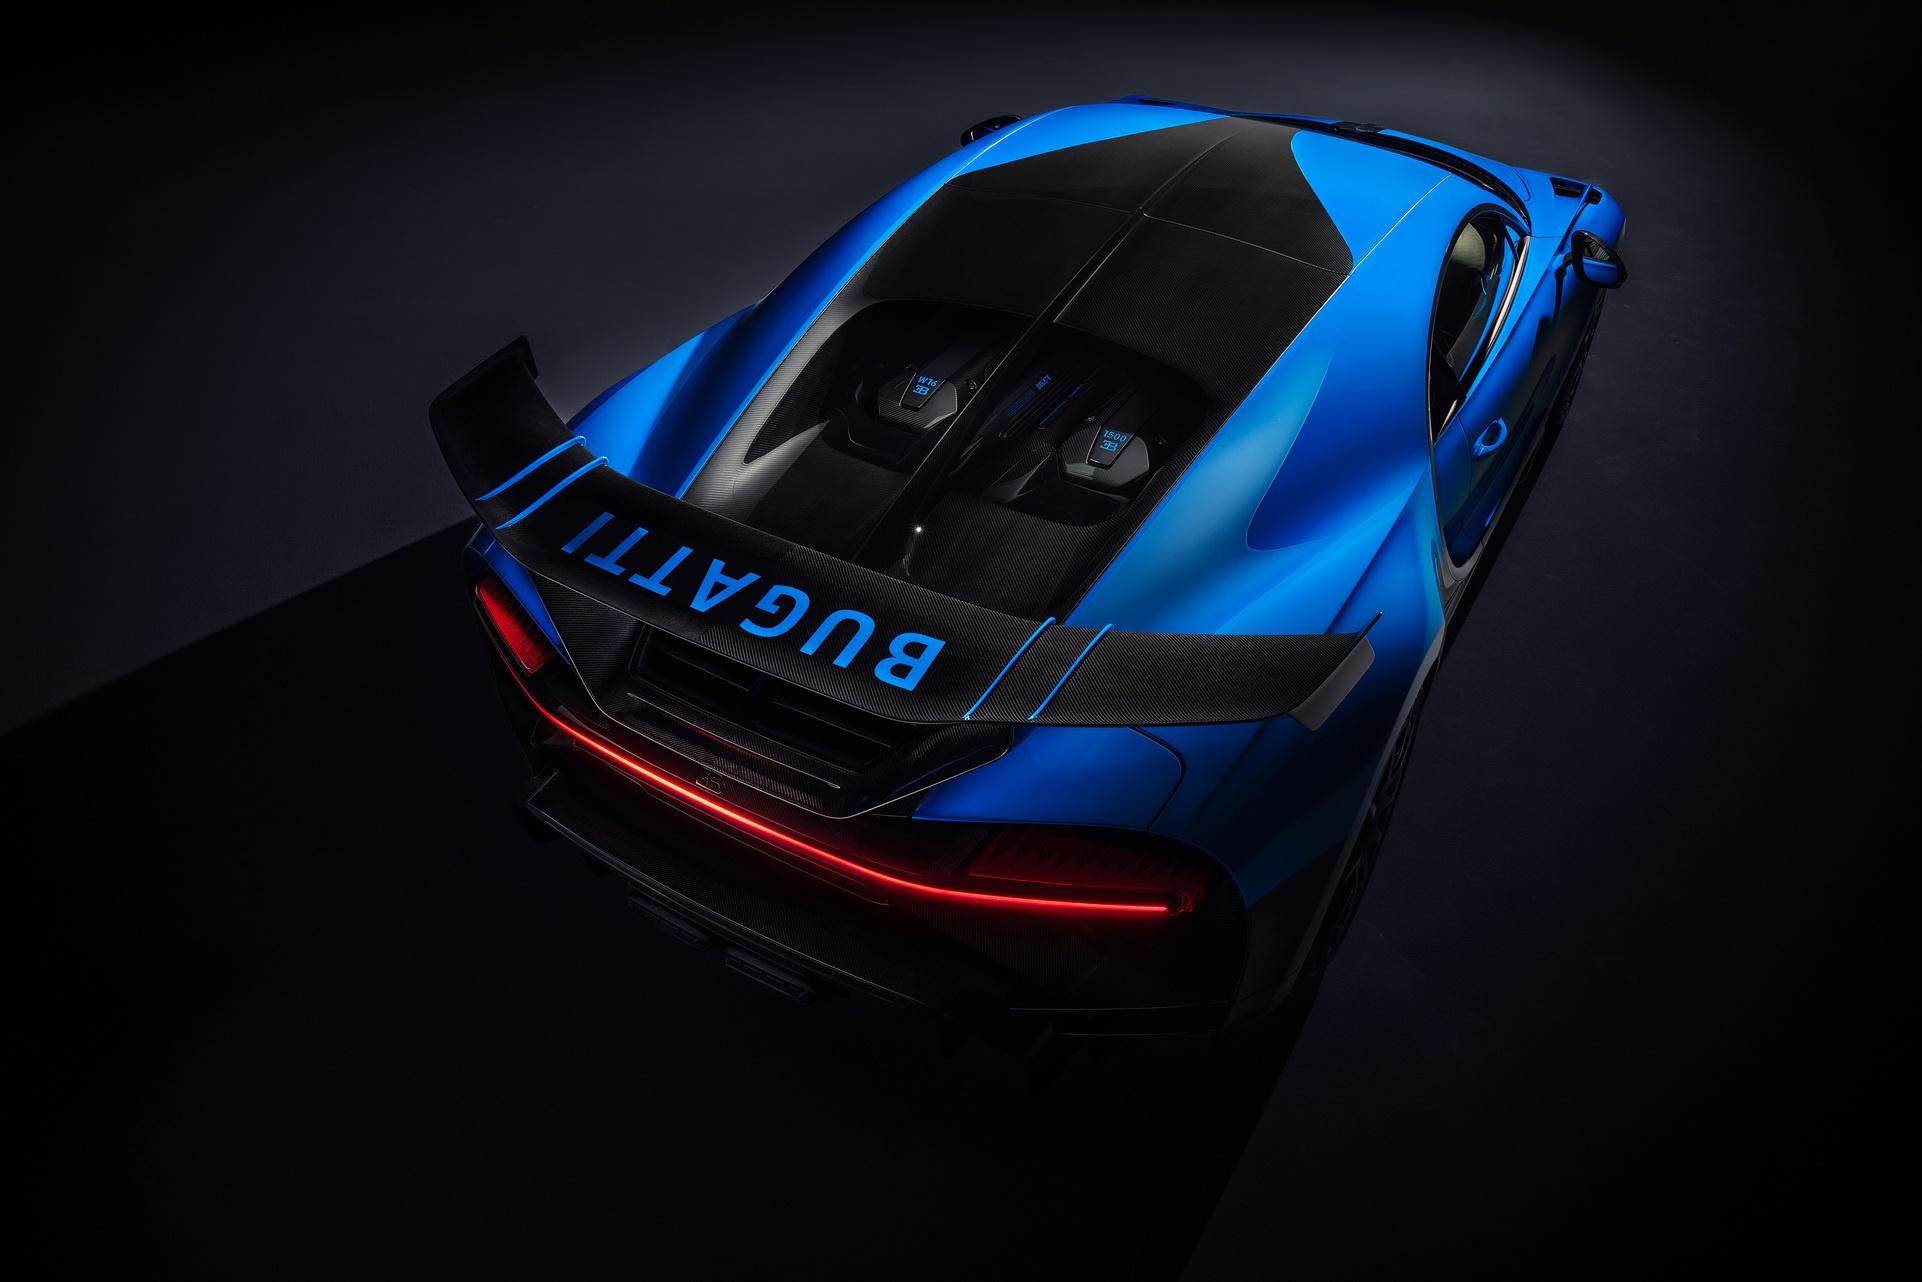 Bugatti Chiron phien ban moi ra mat - sieu xe gia 3,55 trieu USD hinh anh 11 B.jpg